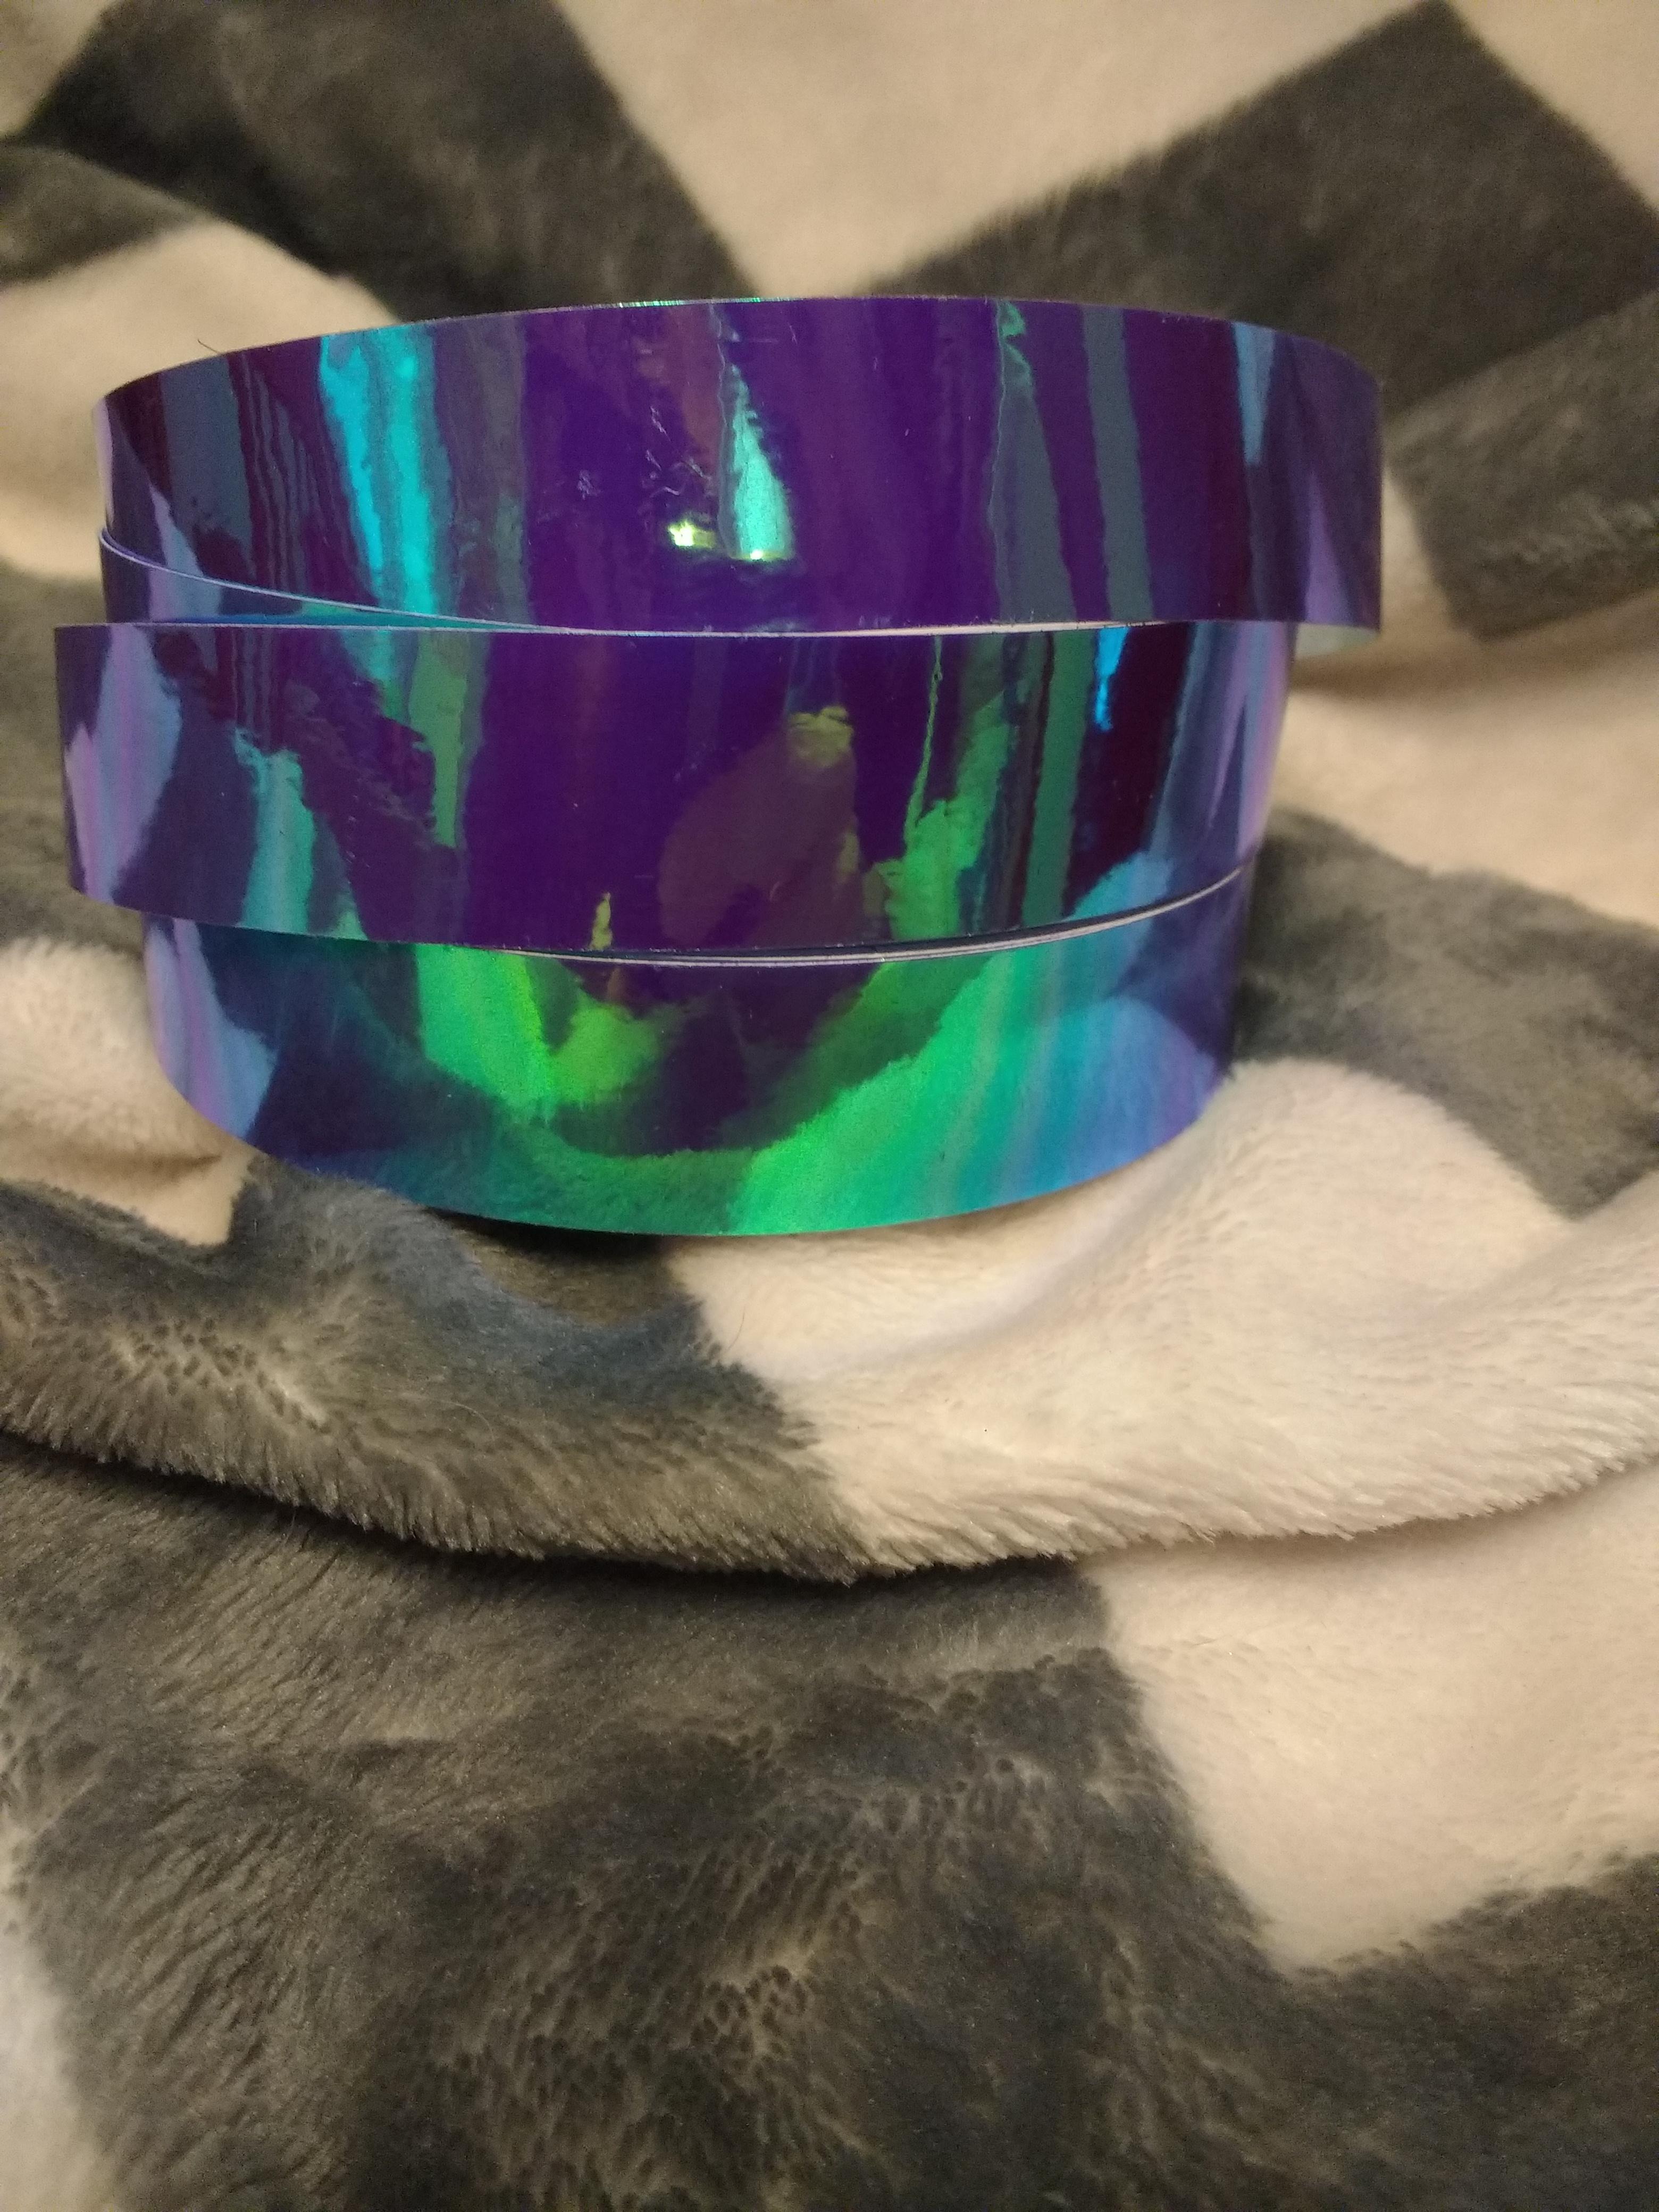 Wild Orchid Hoop Tape